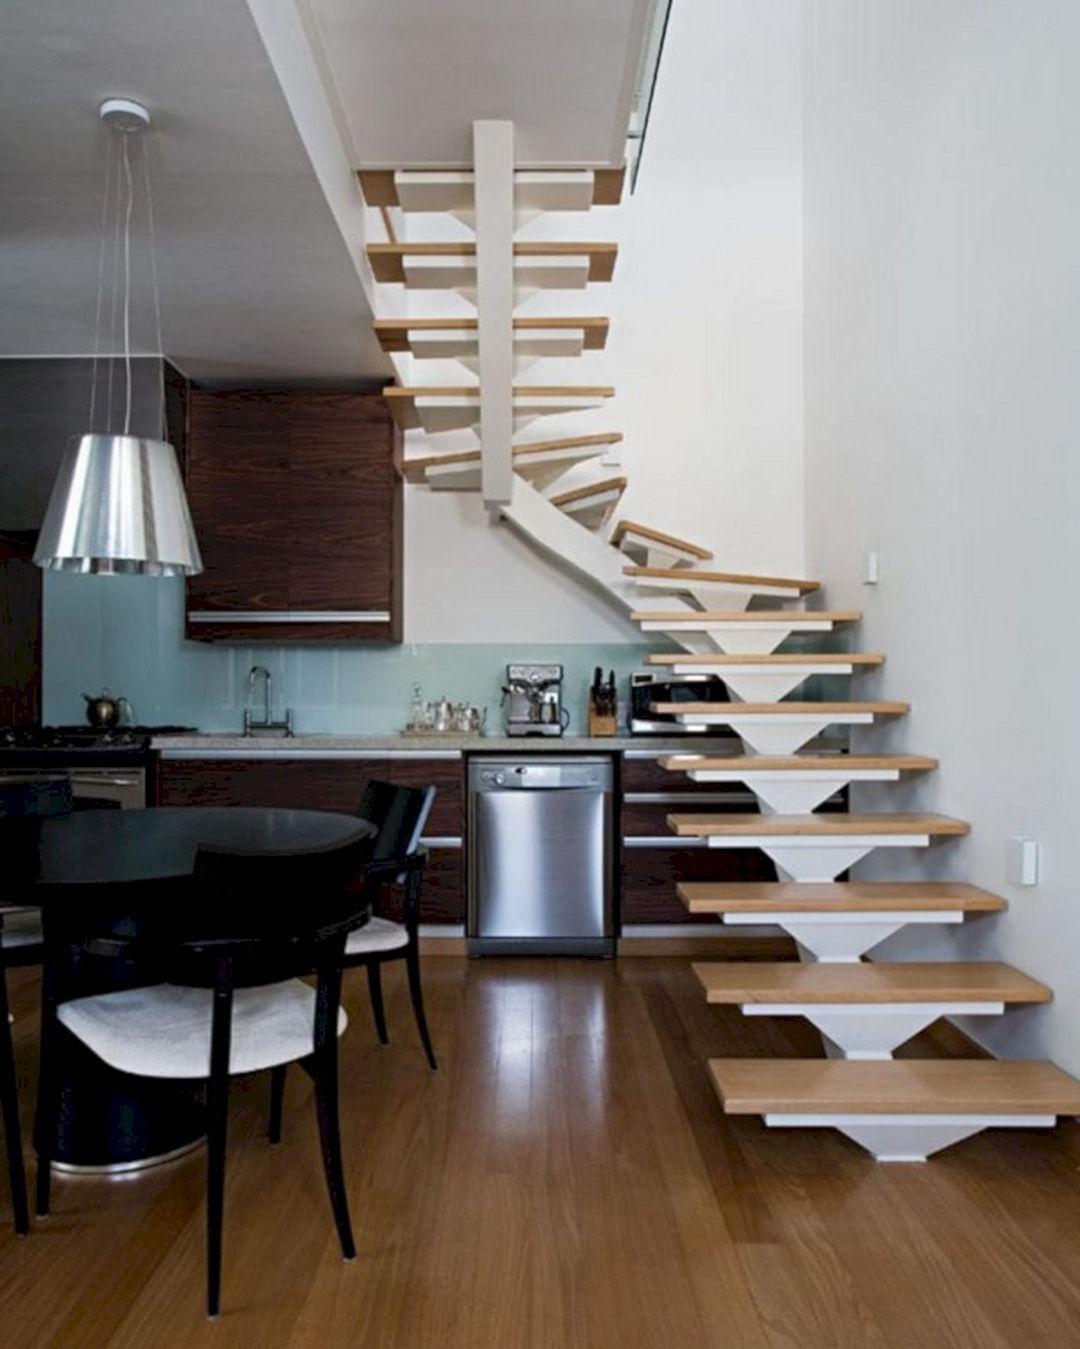 10 Minimalist Kitchen Set Design For Under Stairs You Need